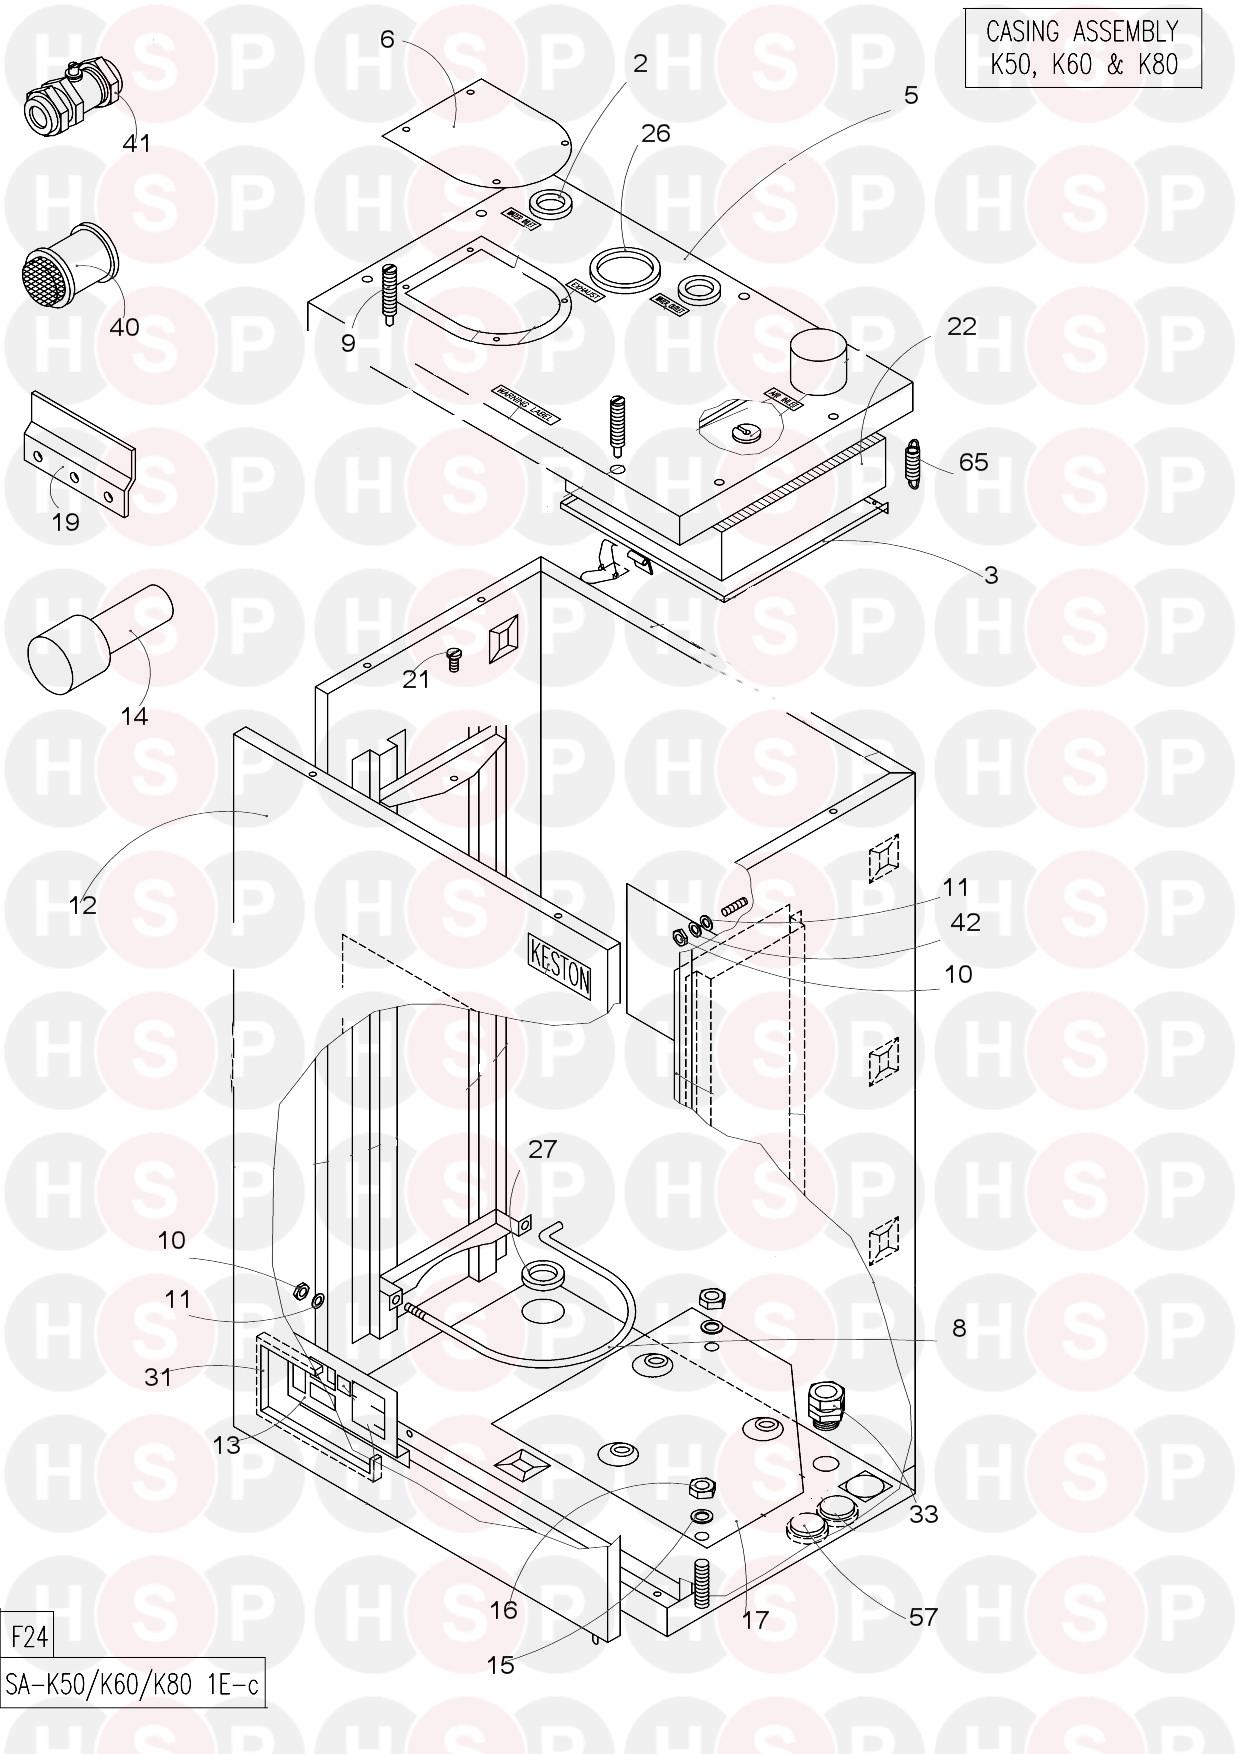 Keston KESTON K50 NG (CASING) Diagram | Heating Spare Parts on